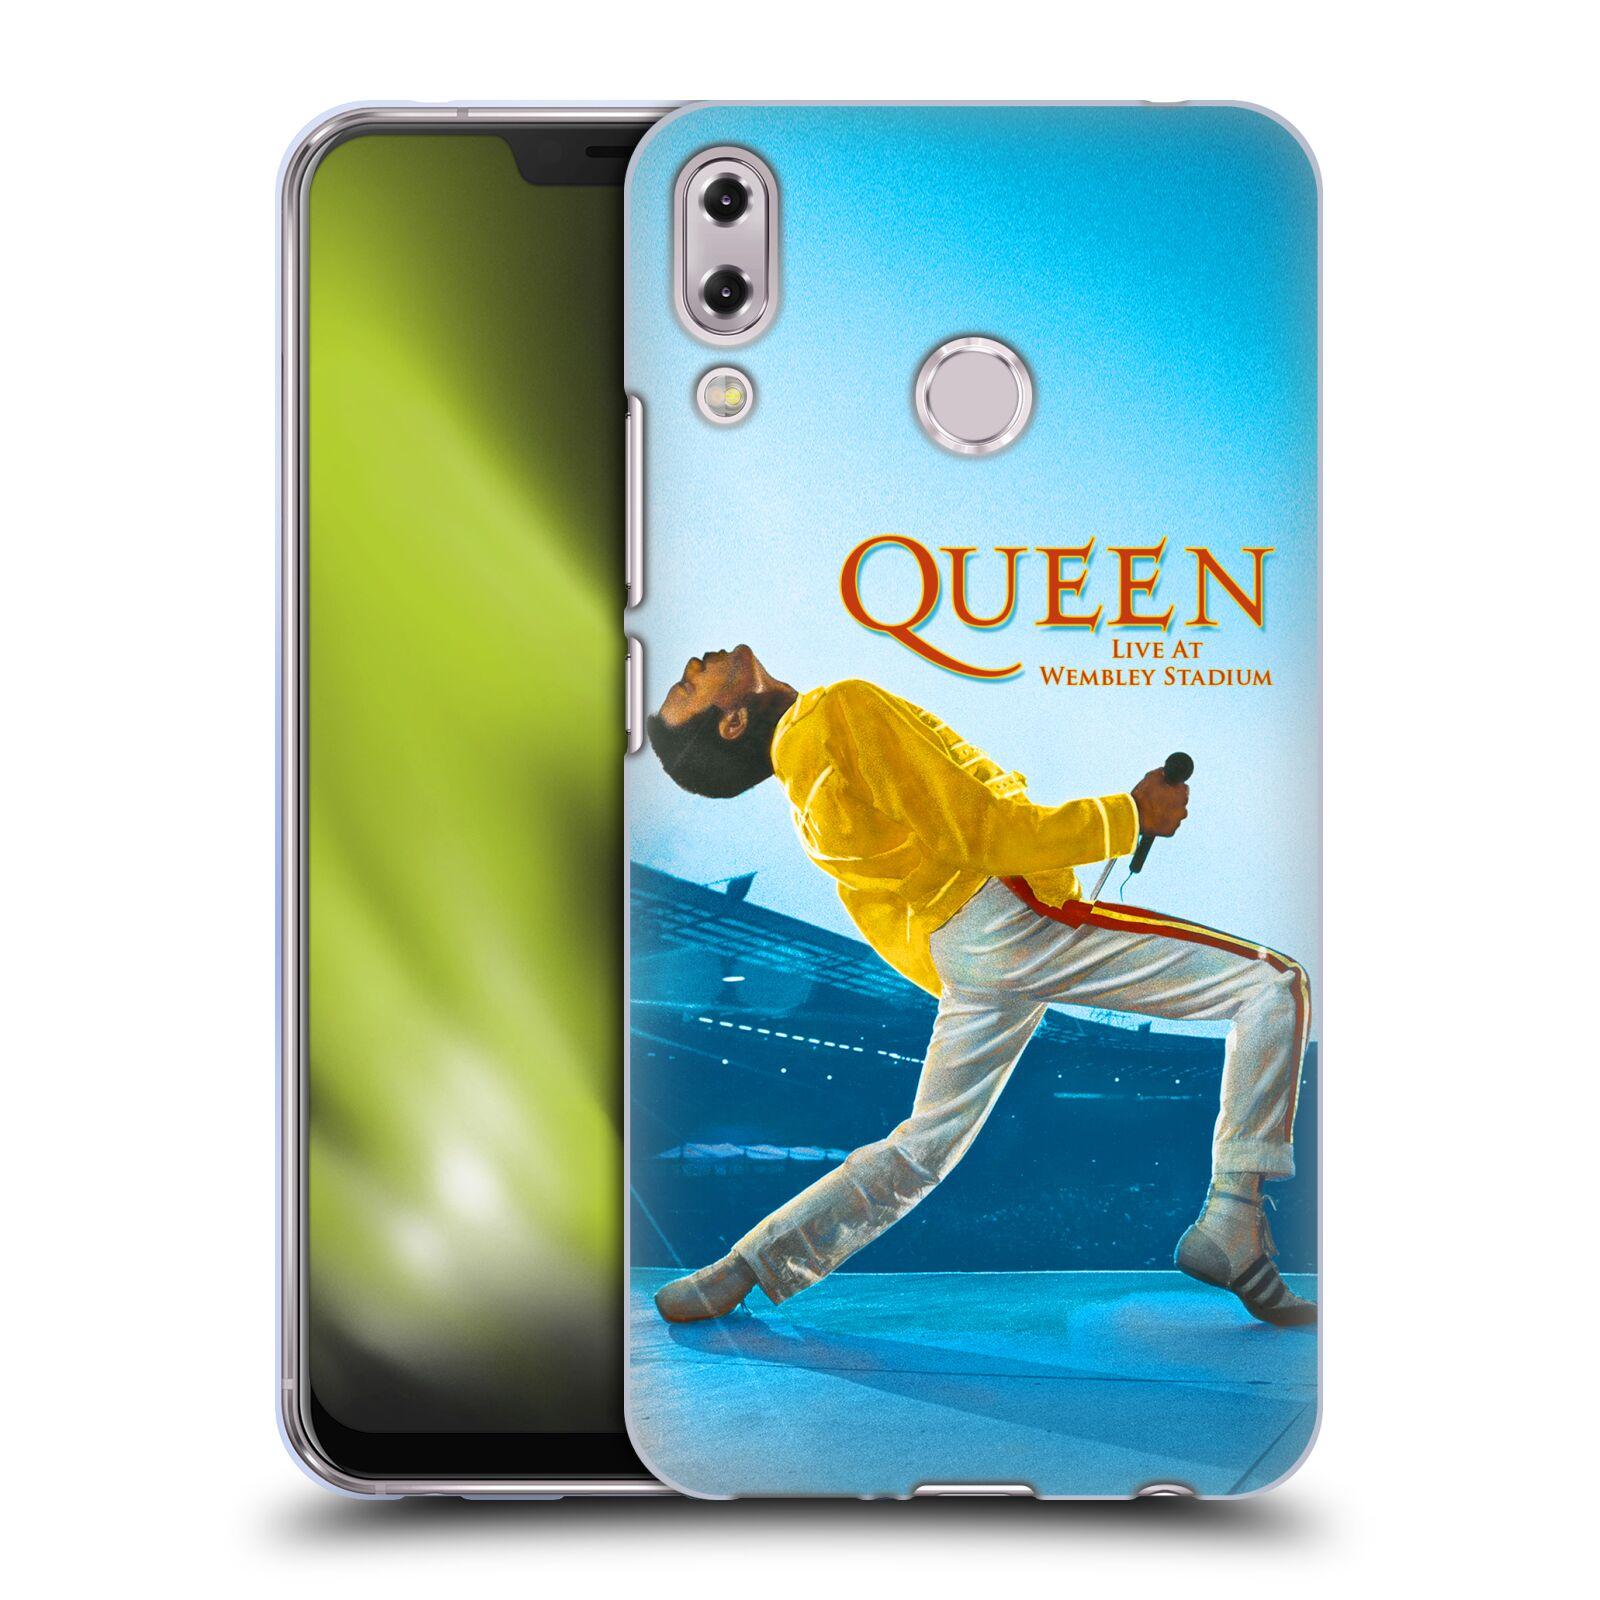 Silikonové pouzdro na mobil Asus ZenFone 5 ZE620KL - Head Case - Queen - Freddie Mercury